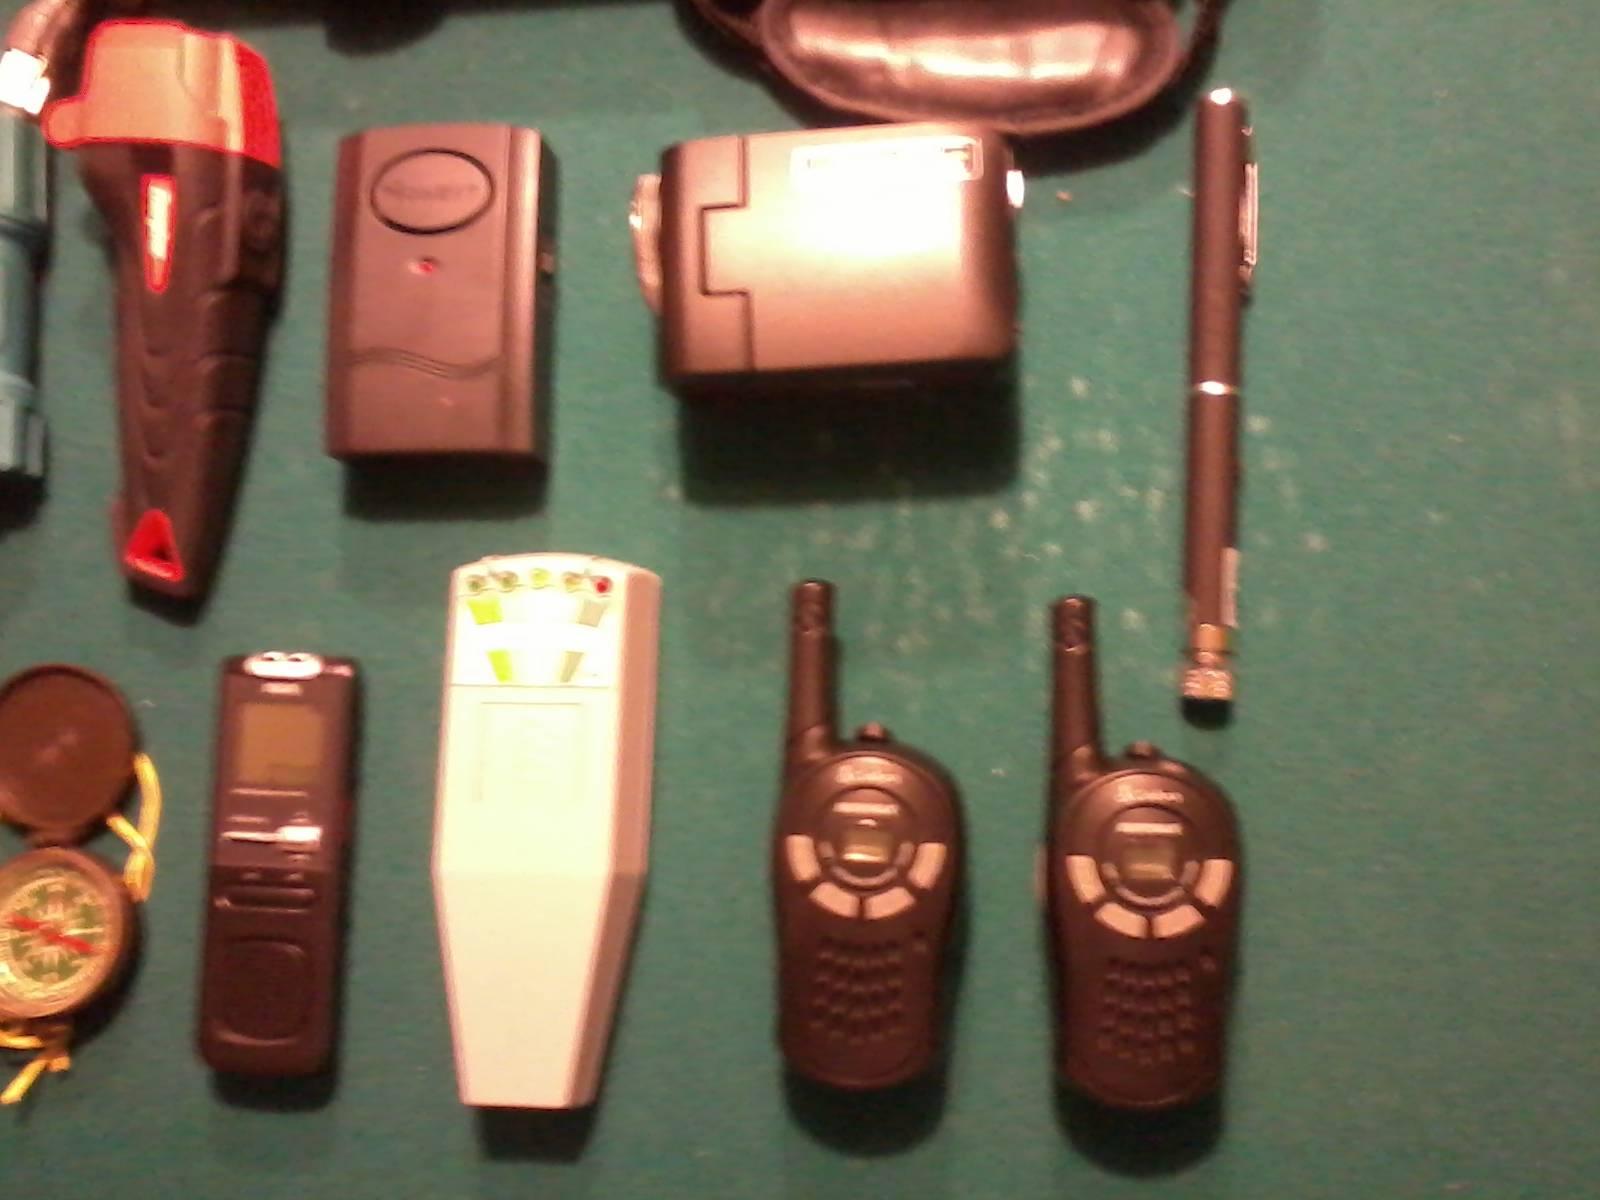 Full Spectrum Video Camera, Laser Light Grid Pen, Walkie Talkies